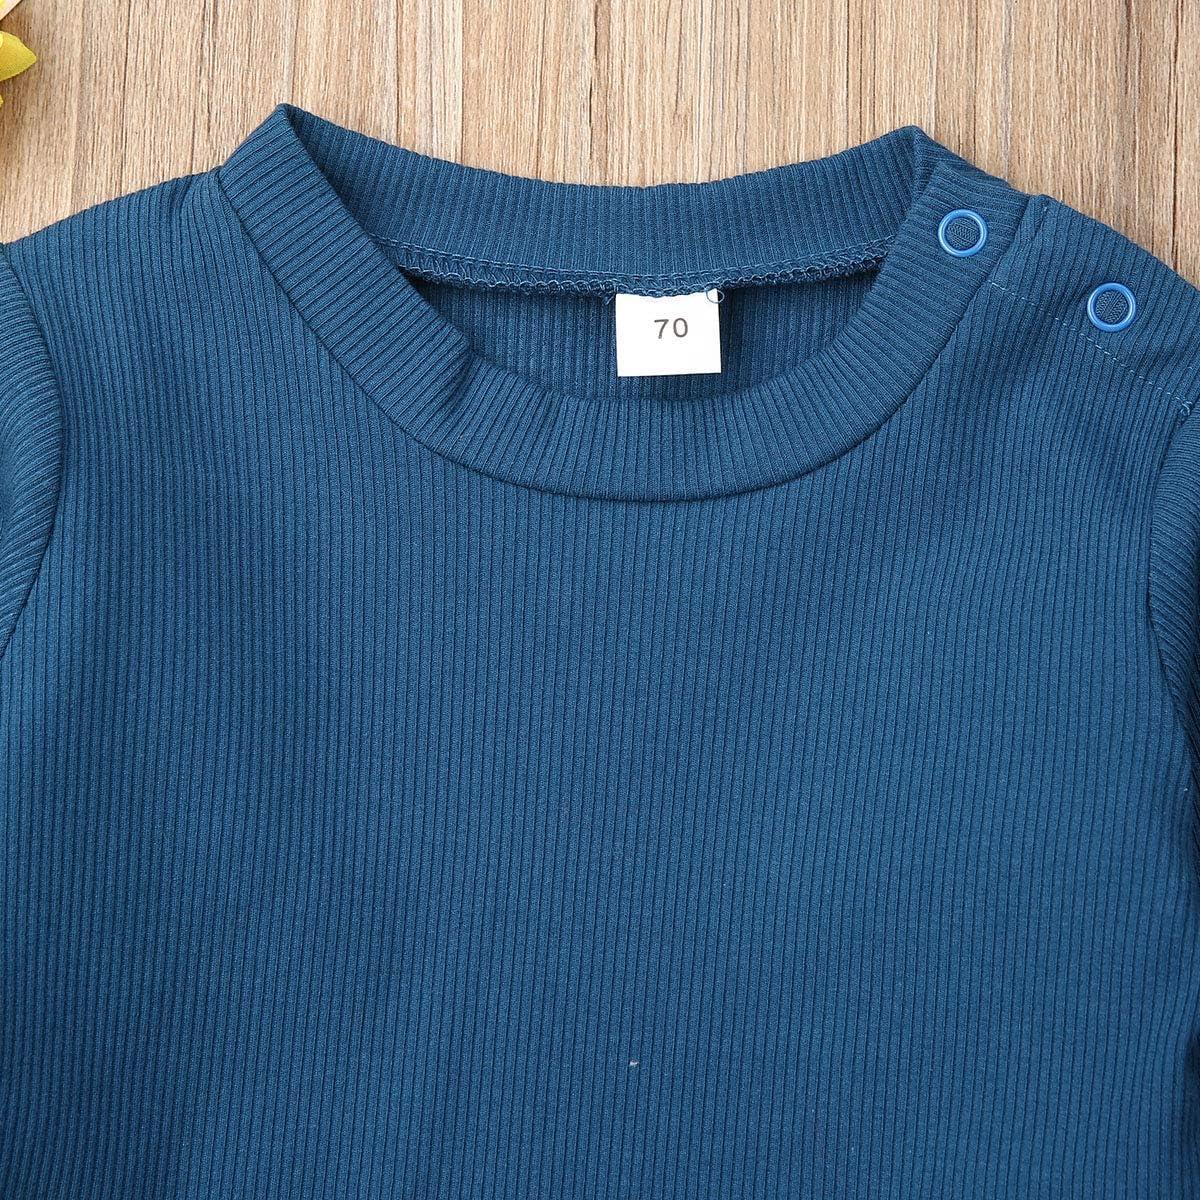 Opperiaya Baby Boys Girls Organic Cotton Soft Solid Sleepwear Tee+Pants 2pcs Pajama Set Sleeper Outfit